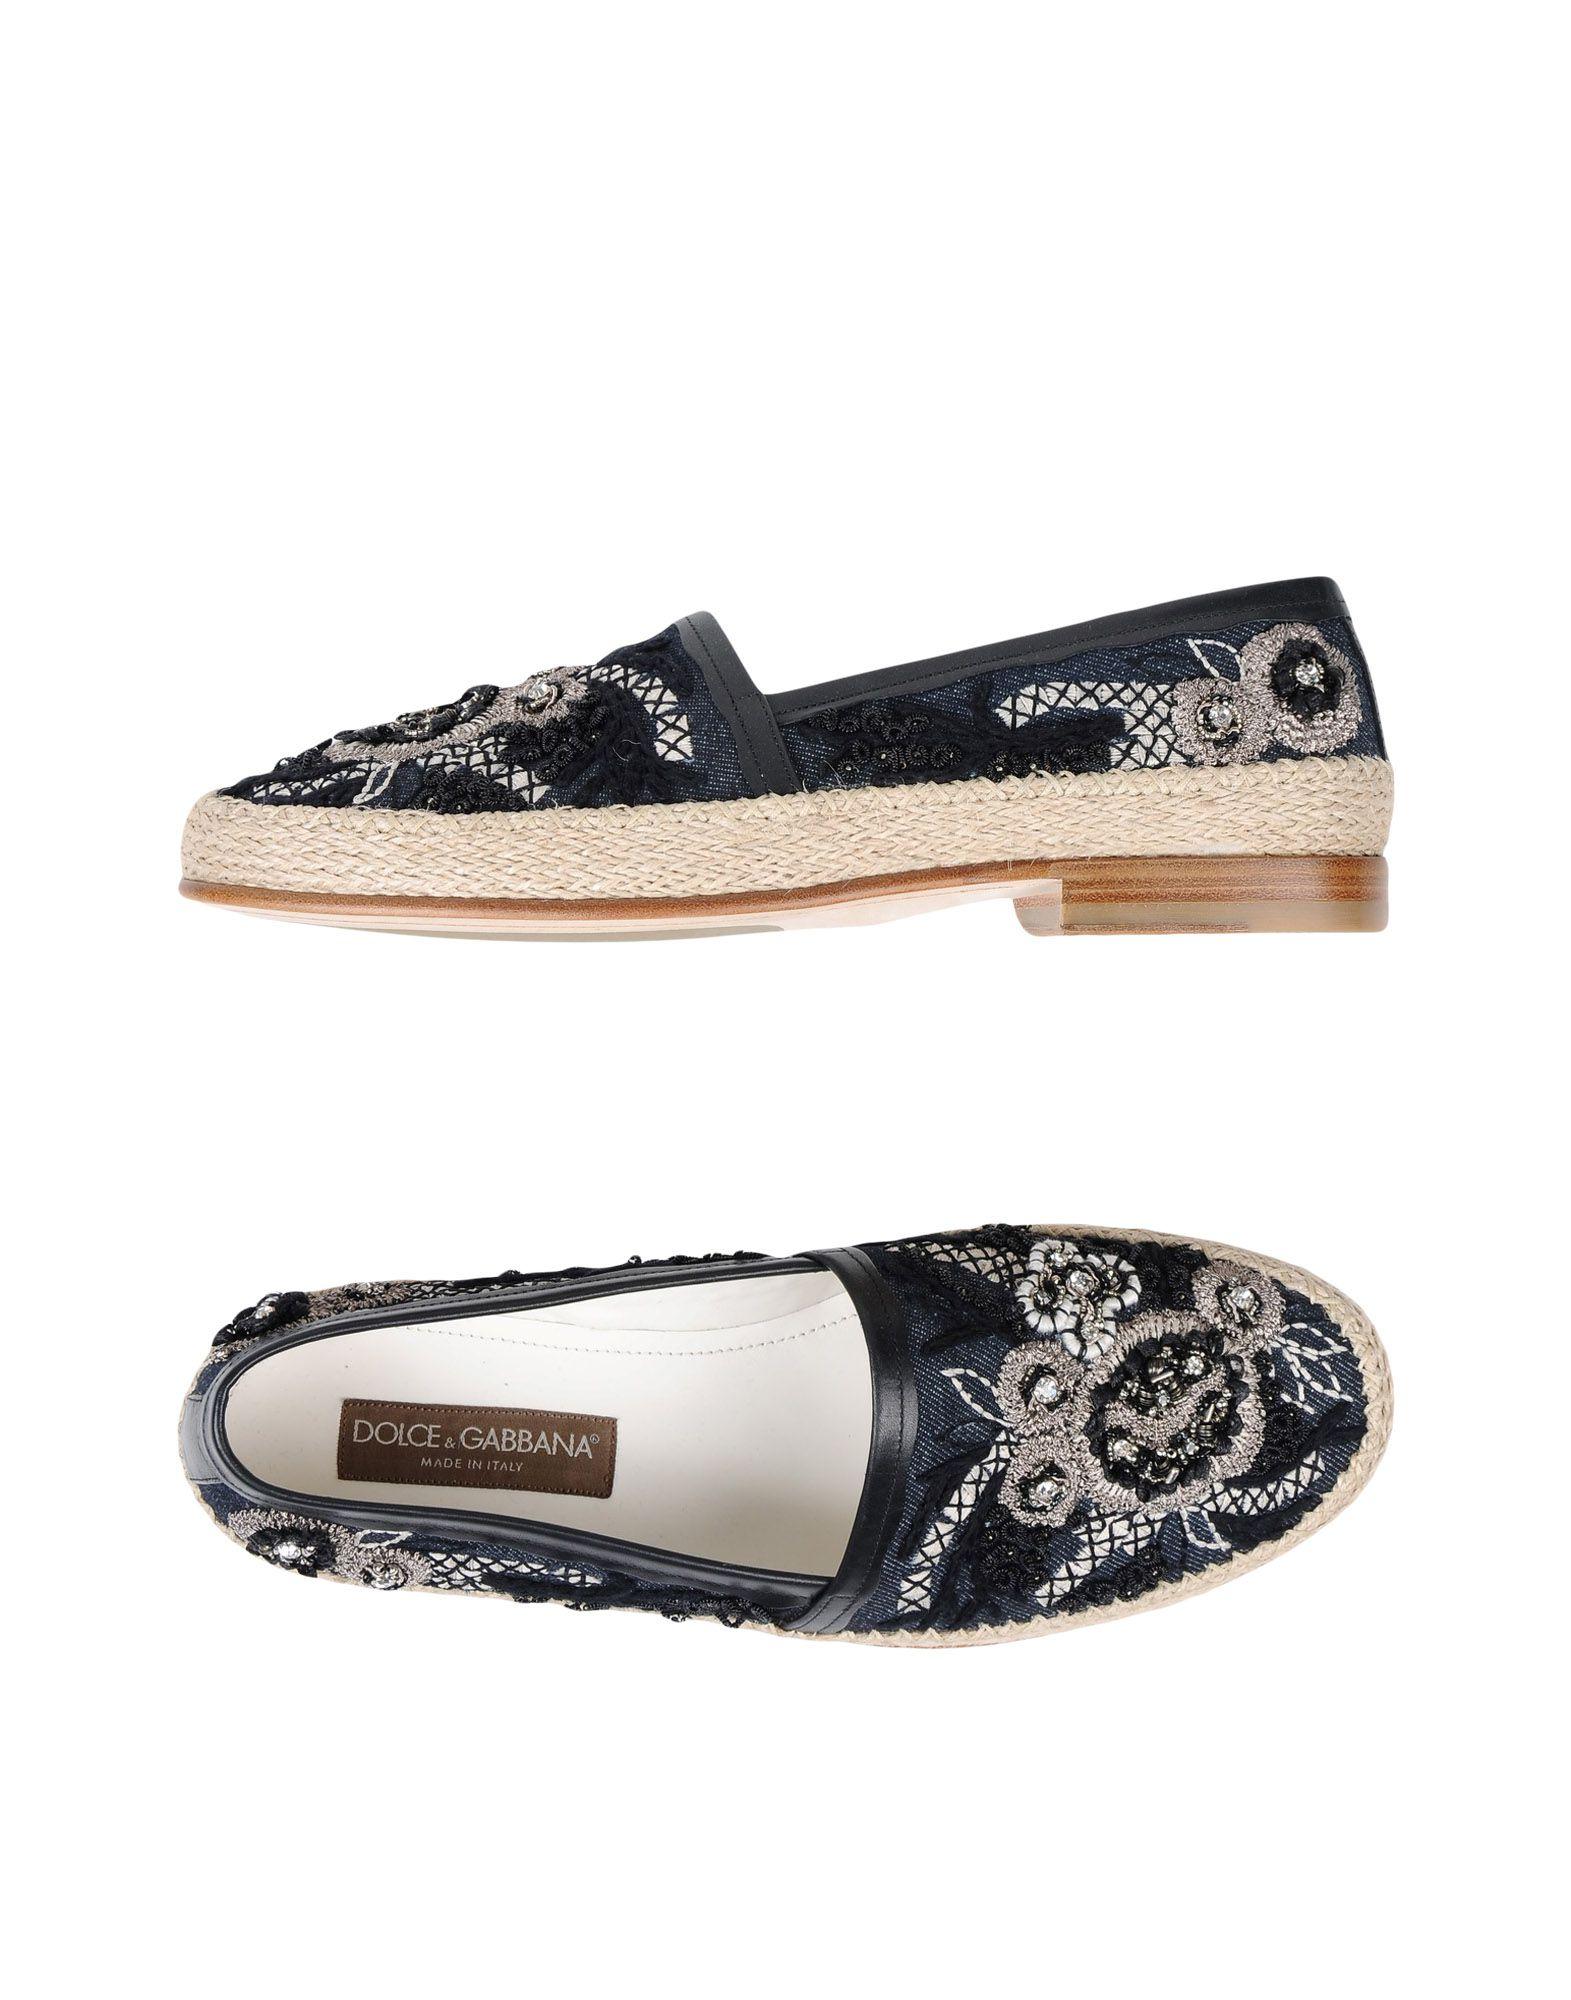 Dolce & Gabbana Gabbana Gabbana Espadrilles - Men Dolce & Gabbana Espadrilles online on  Canada - 11520662WA 61412c